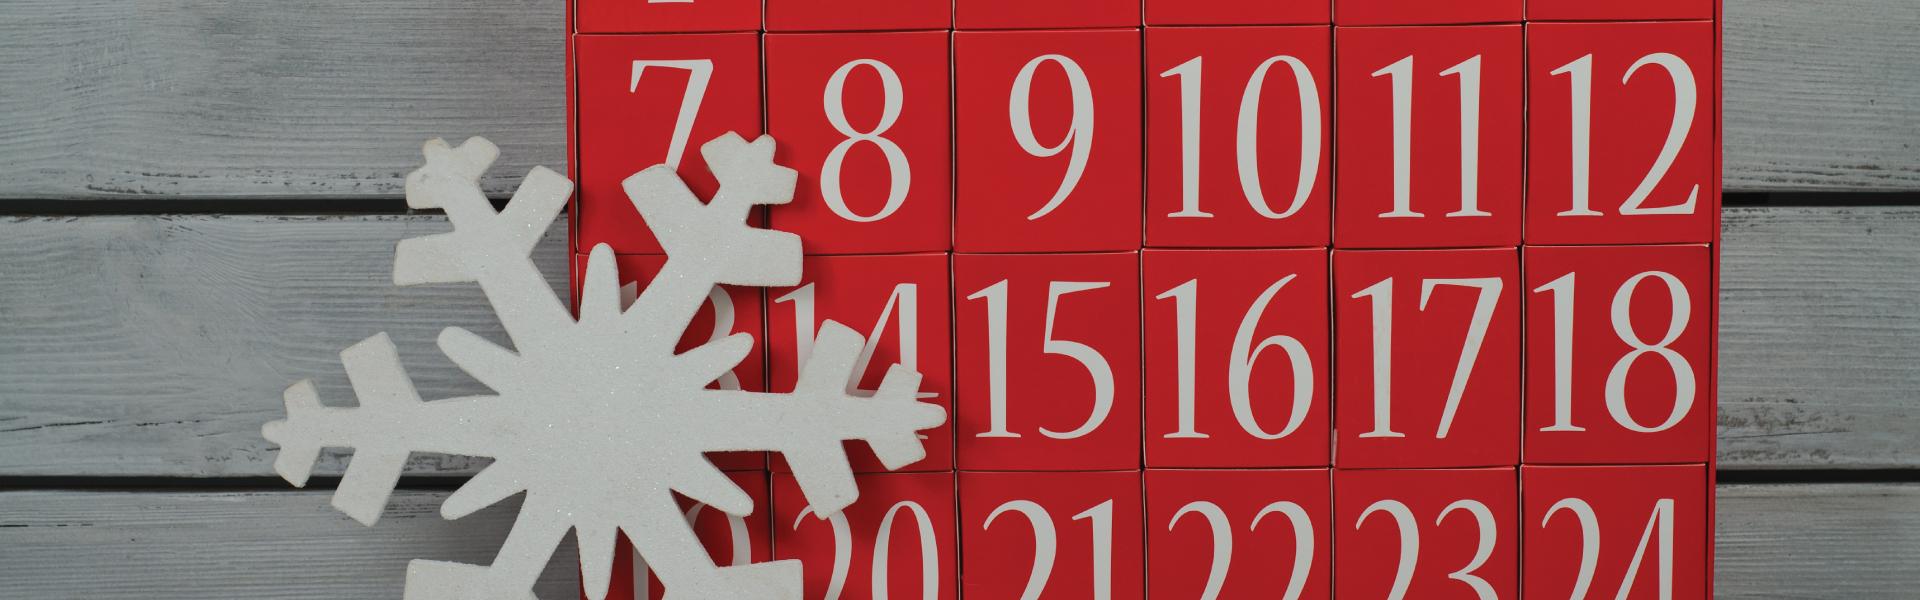 Quanto Manca Al Natale.Quanto Manca A Natale 2020 Forumforyou It